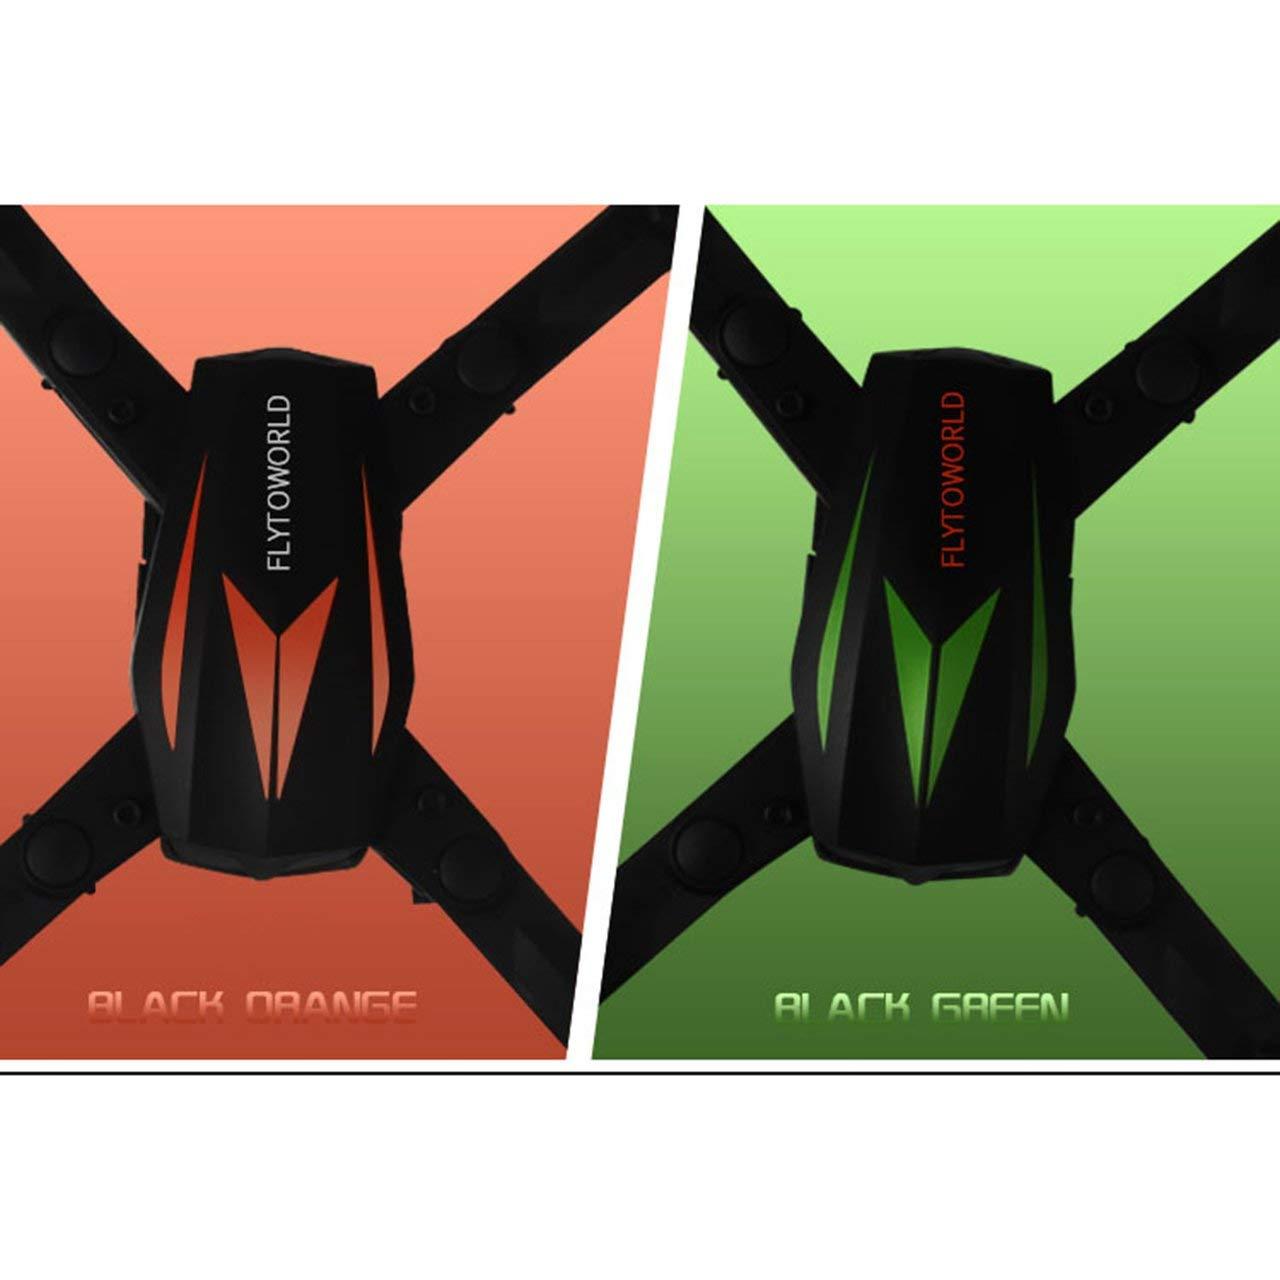 Jasnyfall F12W Mini Selfie WiFi FPV Faltbare Drone 0.3MP Einstellbare Einstellbare Einstellbare Kamera Altitude Hold Schwarz Grün 7a281b